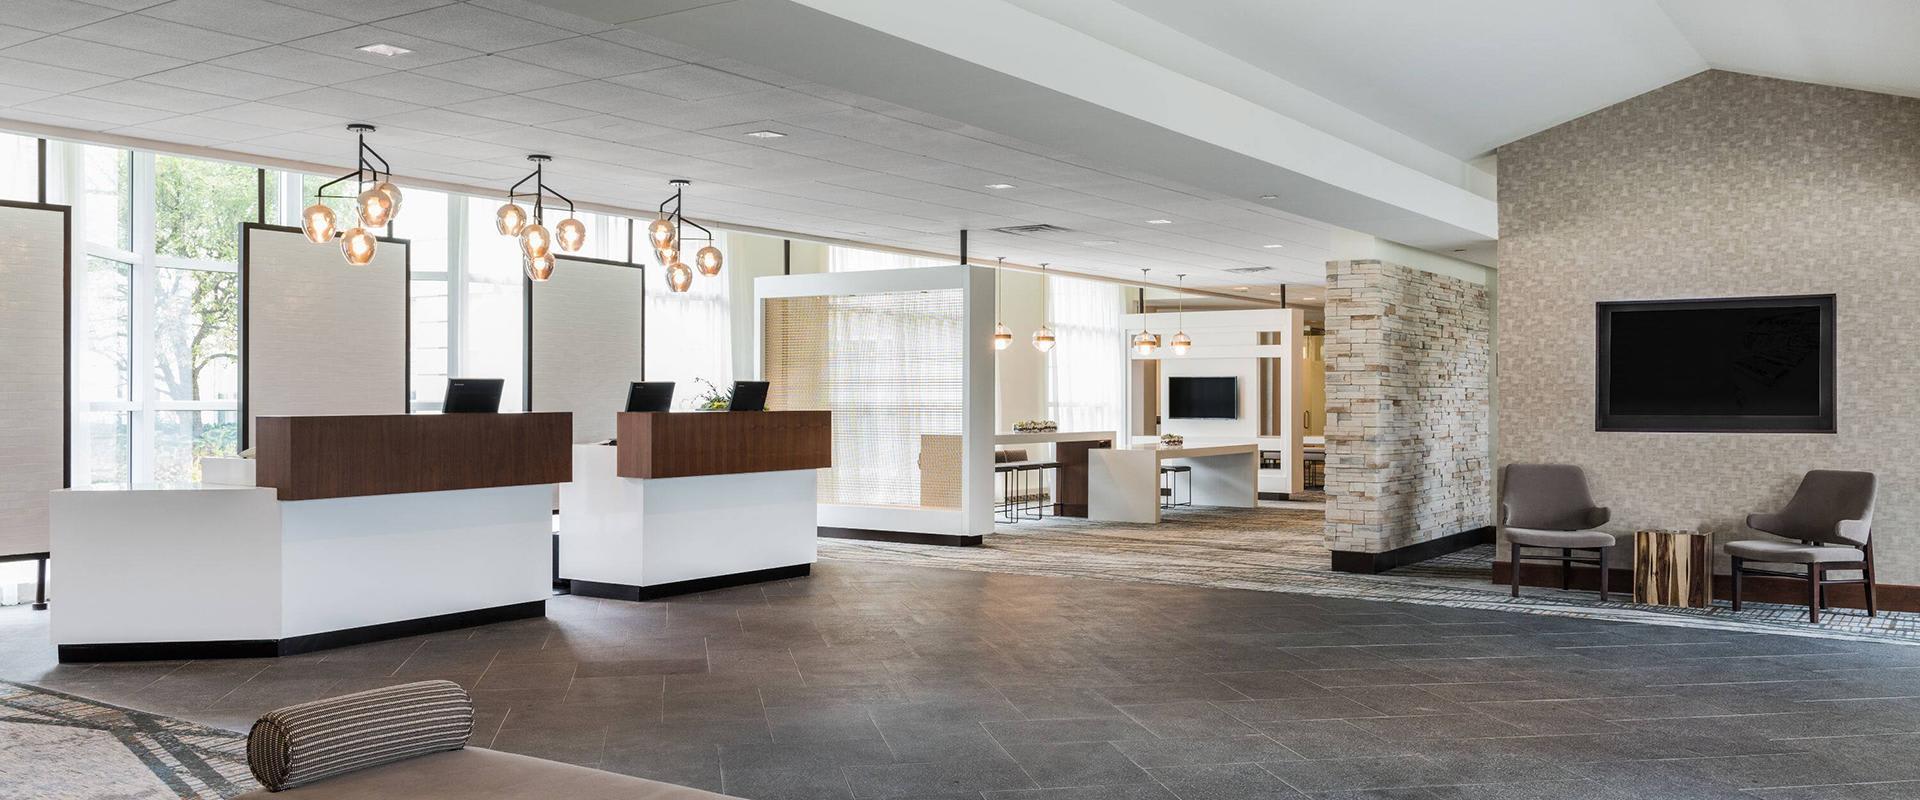 Sonesta Hamilton Park Lobby with Reception Desks and Seating